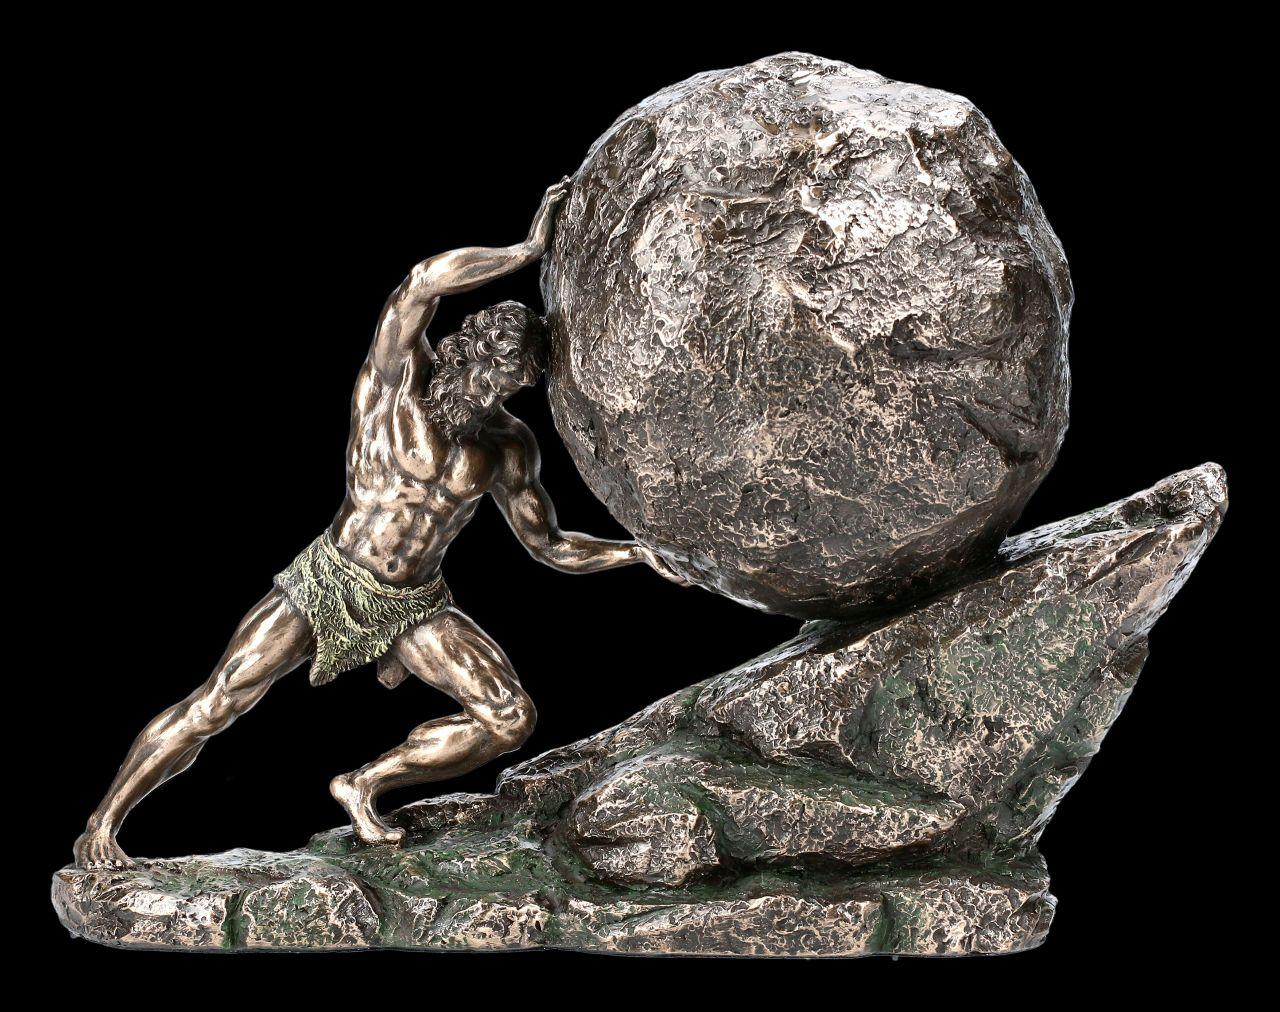 Sisyphus Figurine - King of Corinth